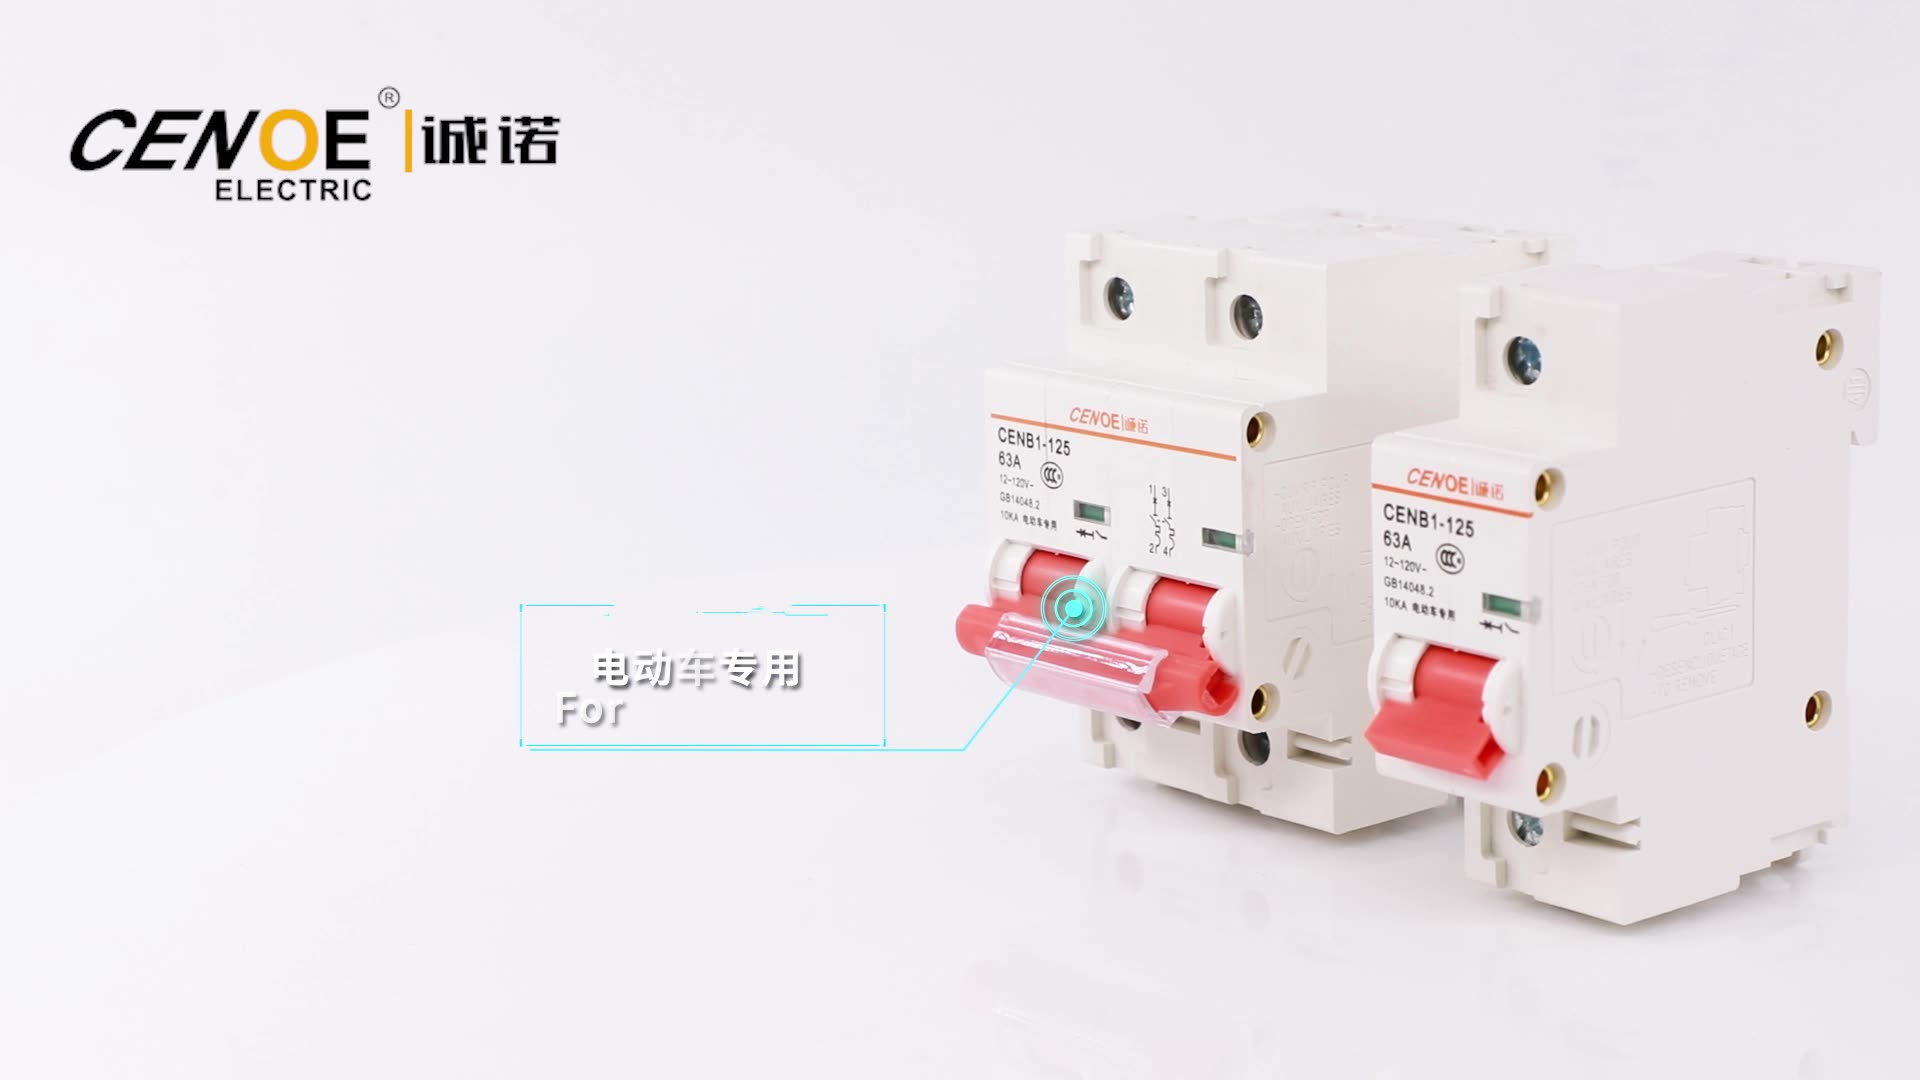 CENB1-125 2P DC 12V 80A Free Sample  Electric Miniature circuit breaker for EV double pole 80 amp MCB good quality diajuntor ACB